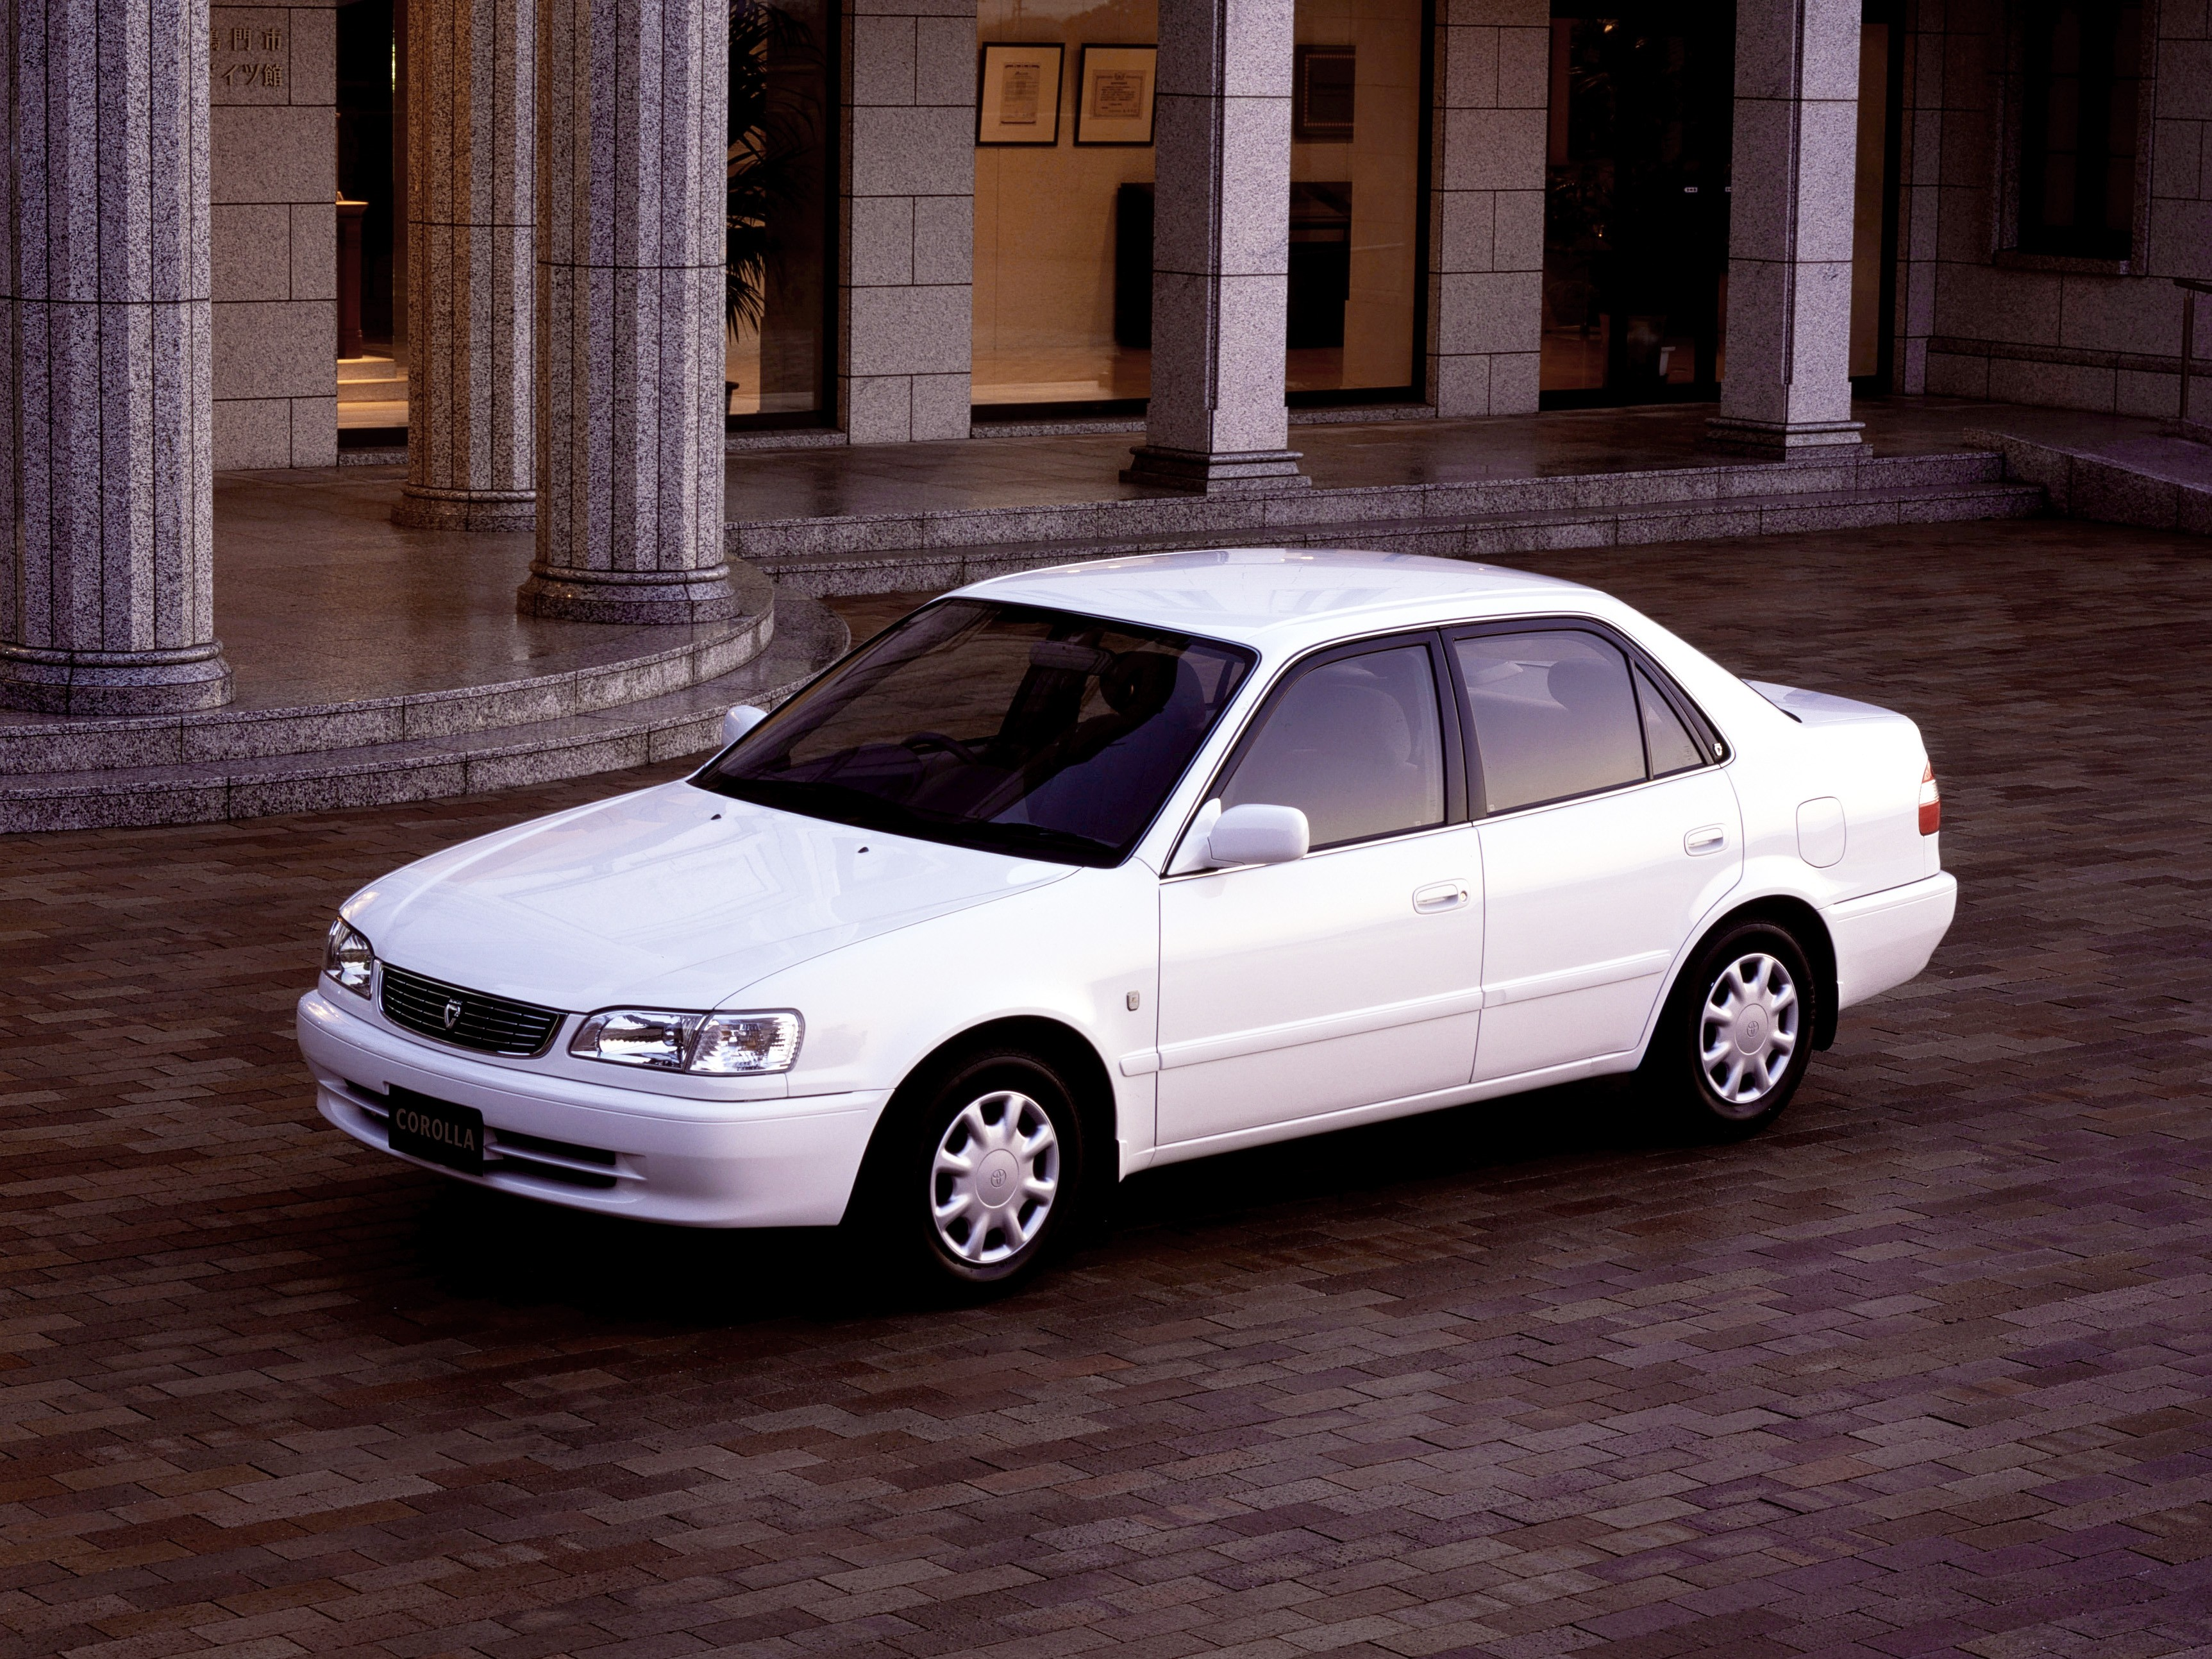 toyota corolla sedan specs  u0026 photos - 1997  1998  1999  2000